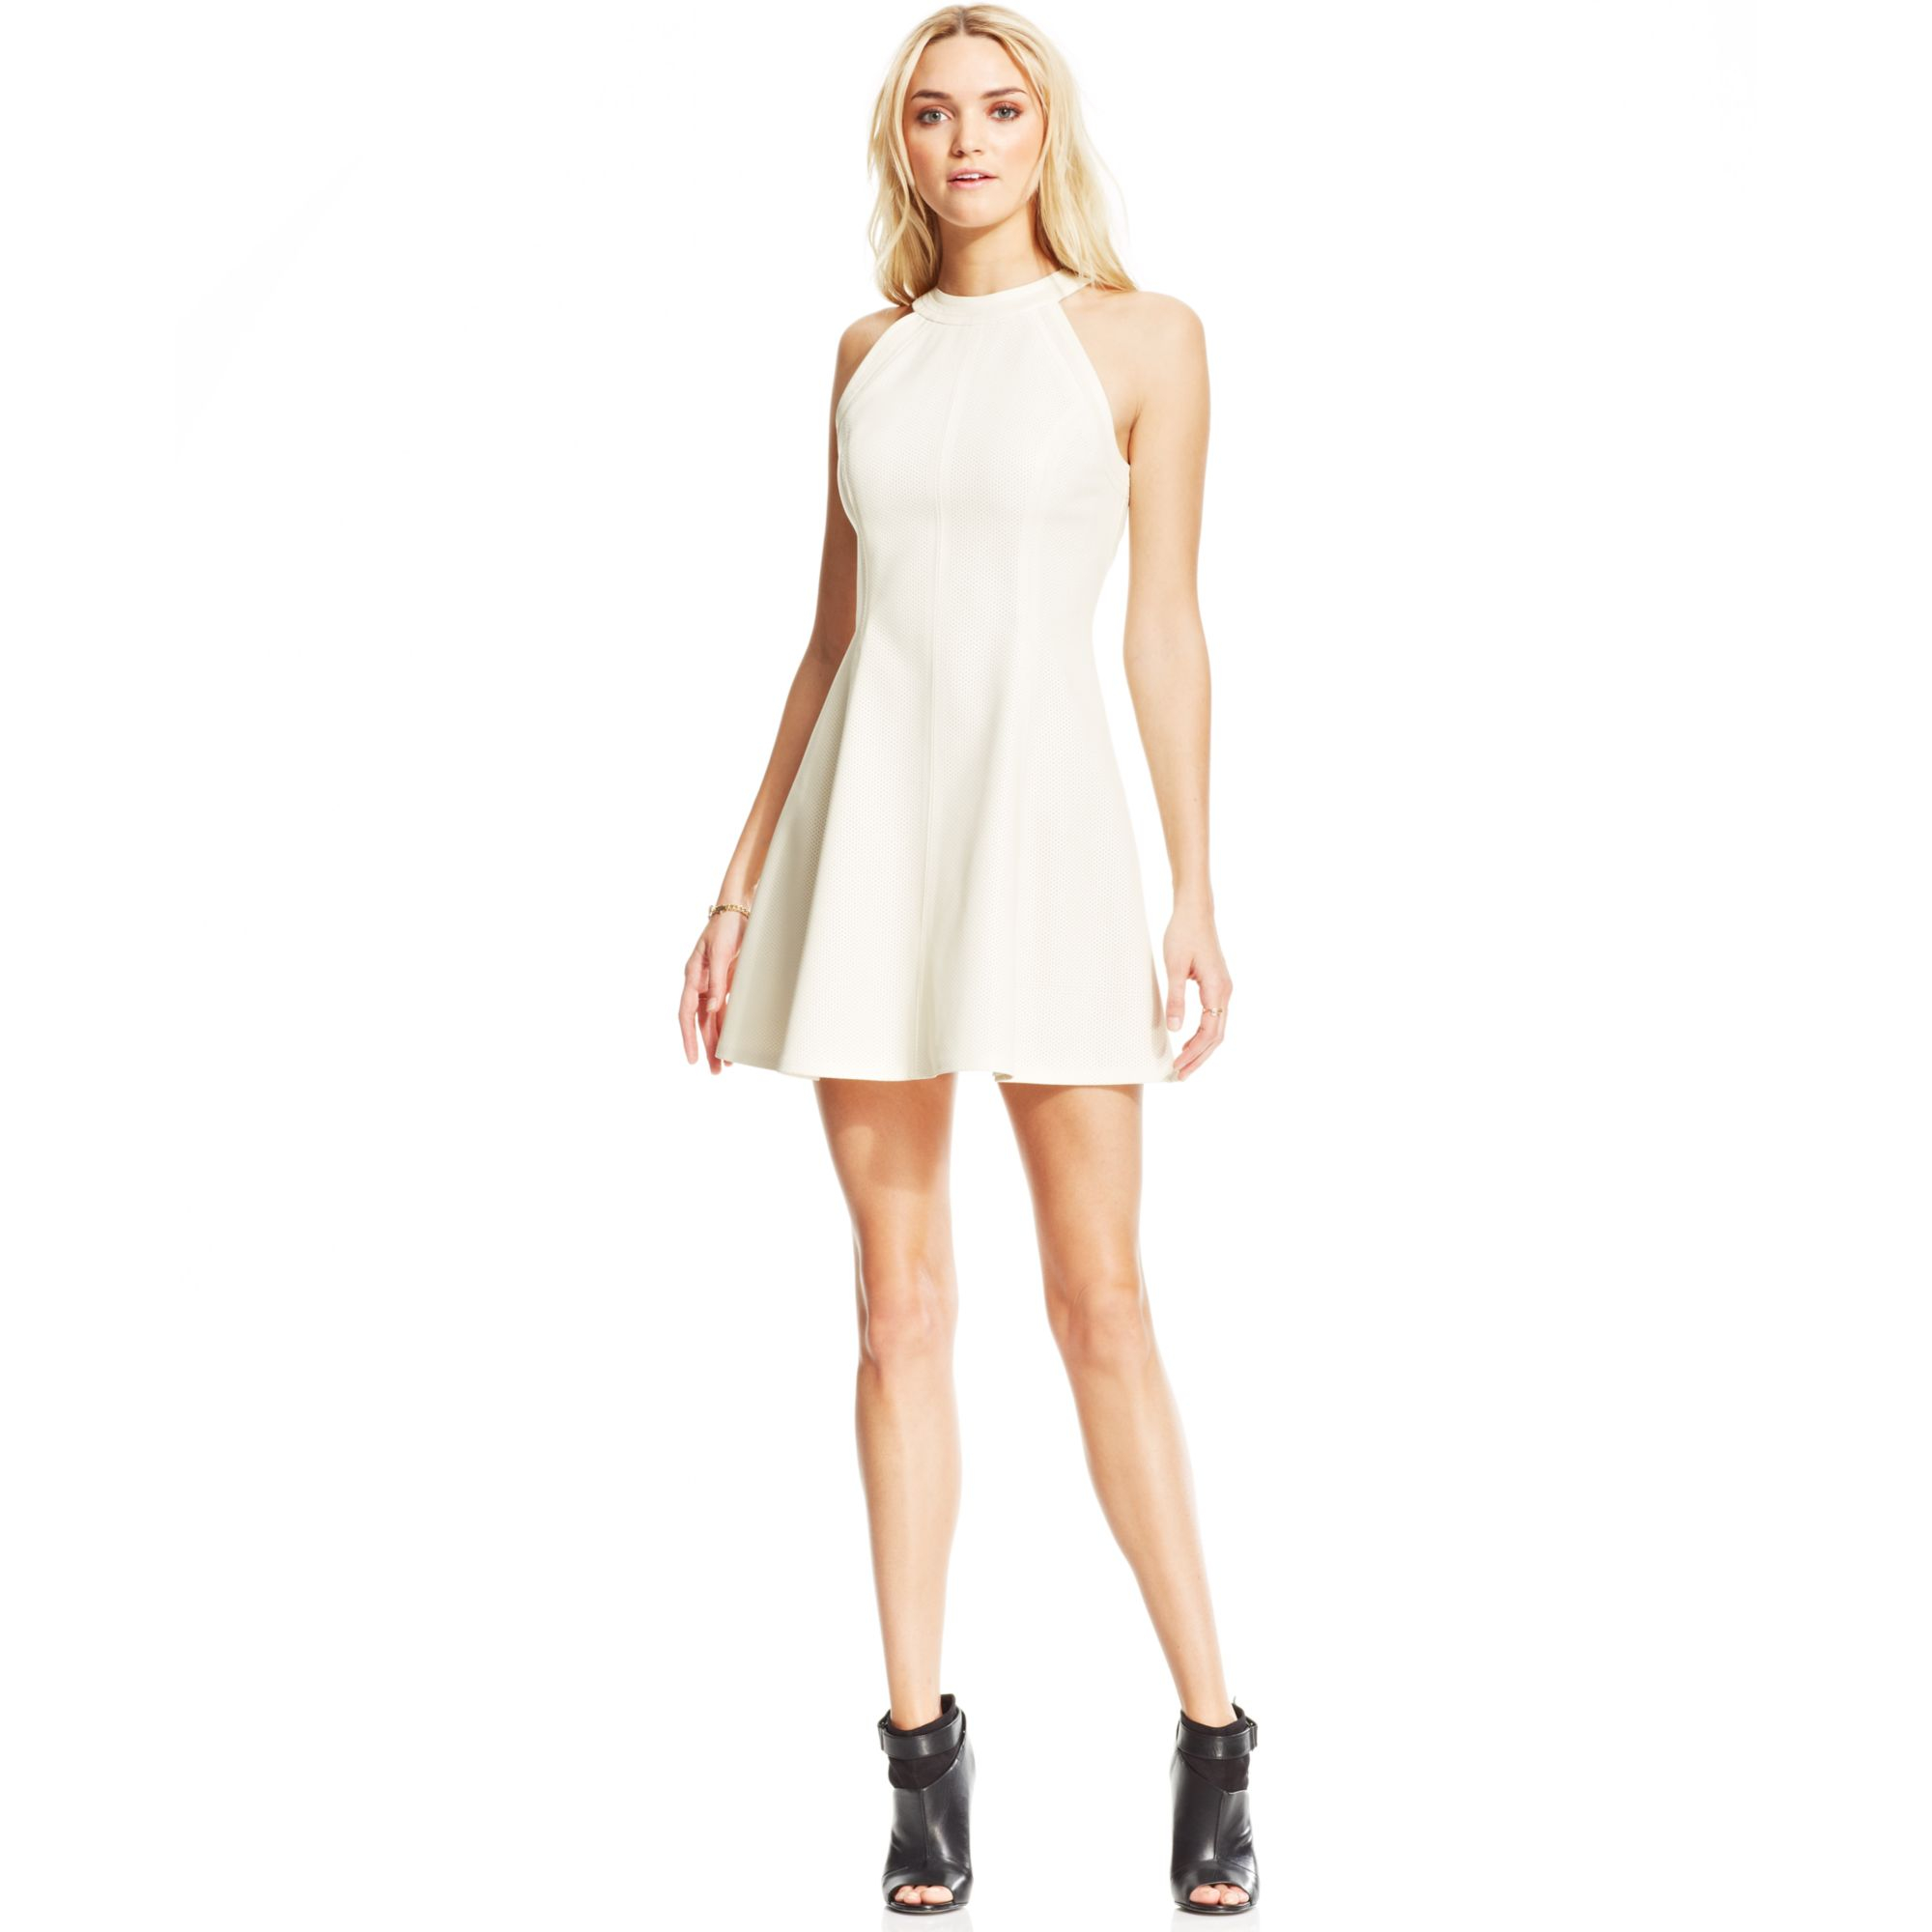 b4d53e698 Lyst - RACHEL Rachel Roy Perforated Fauxleather Dress in White